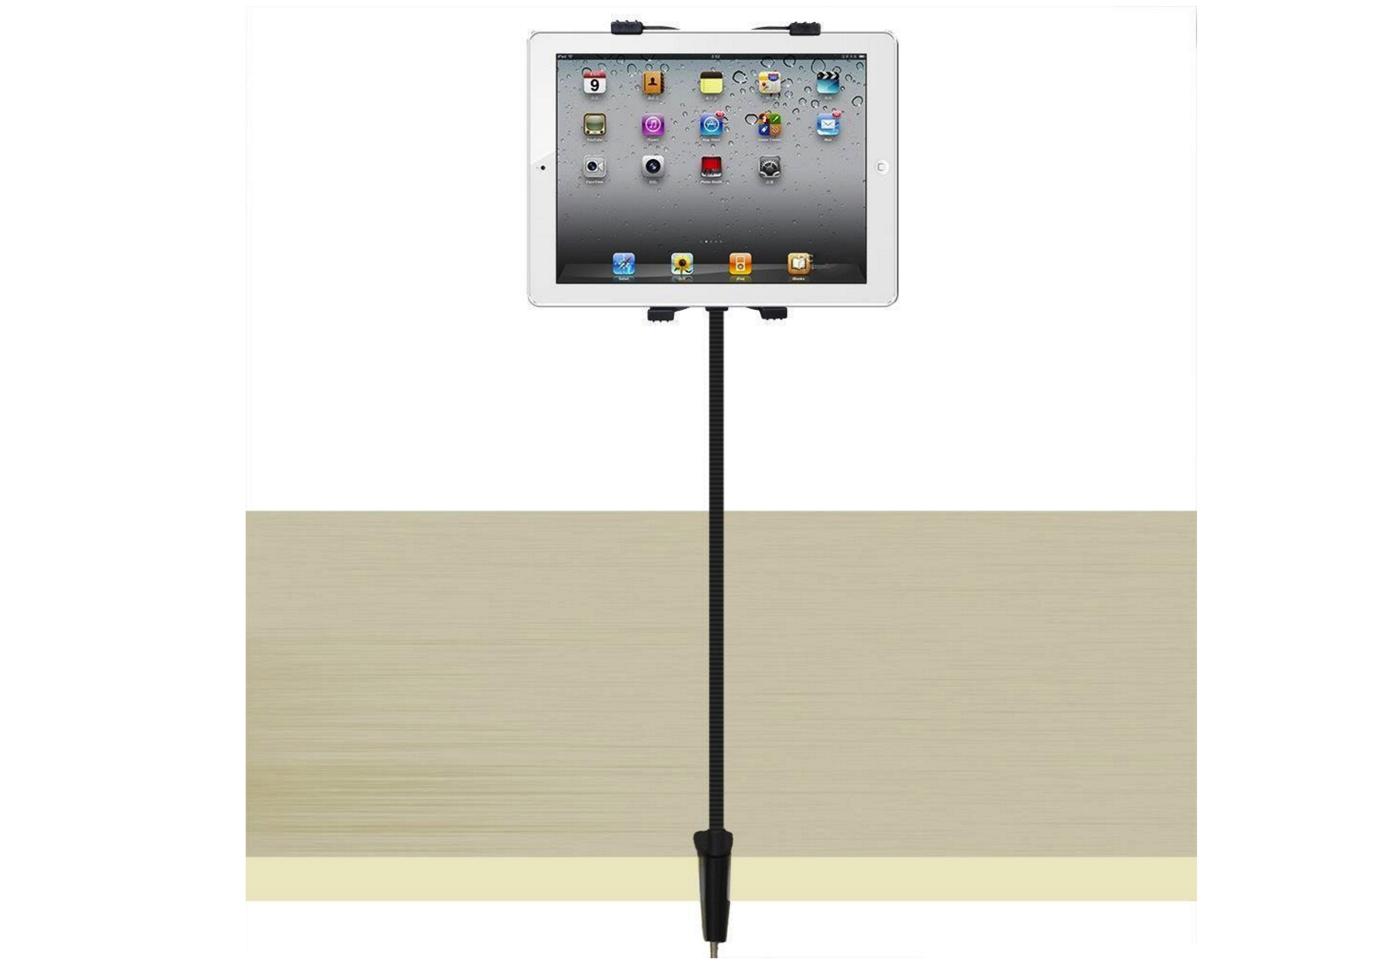 [Apple][iPad]使い勝手をより改善するため「iPad mini 4」専用フレキシブルアーム付きスタンドを予約したよ